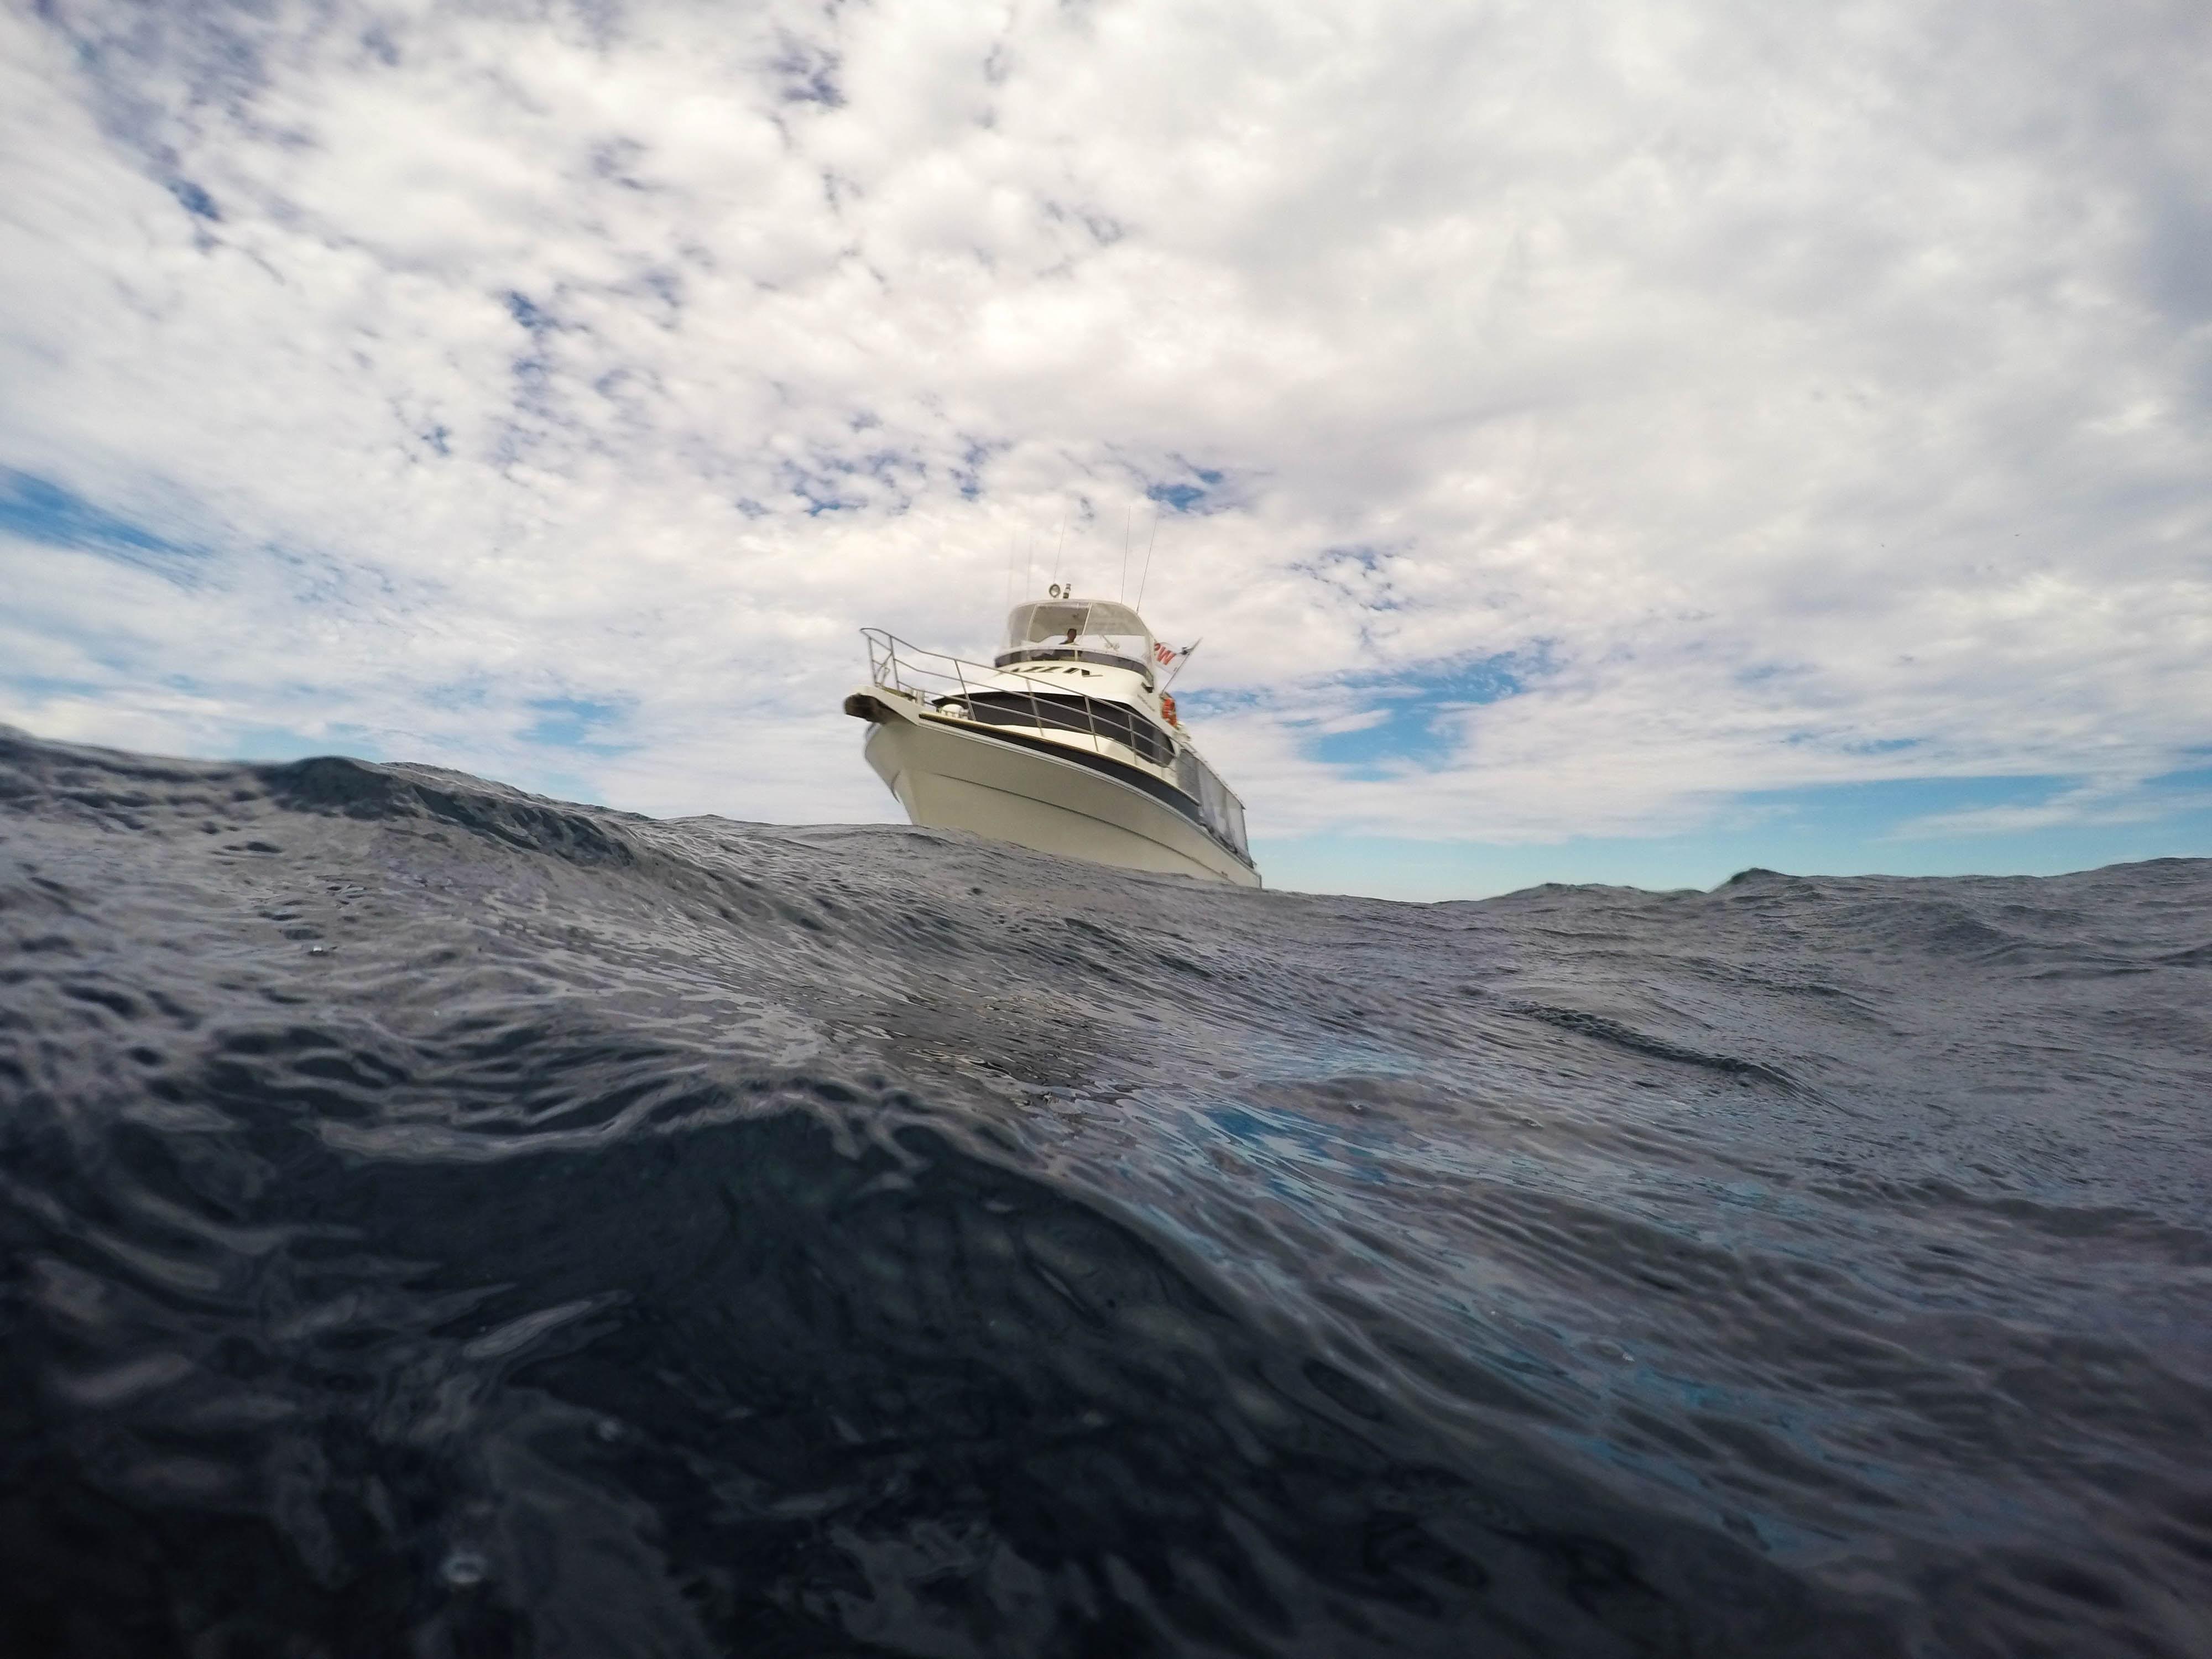 incomming boat